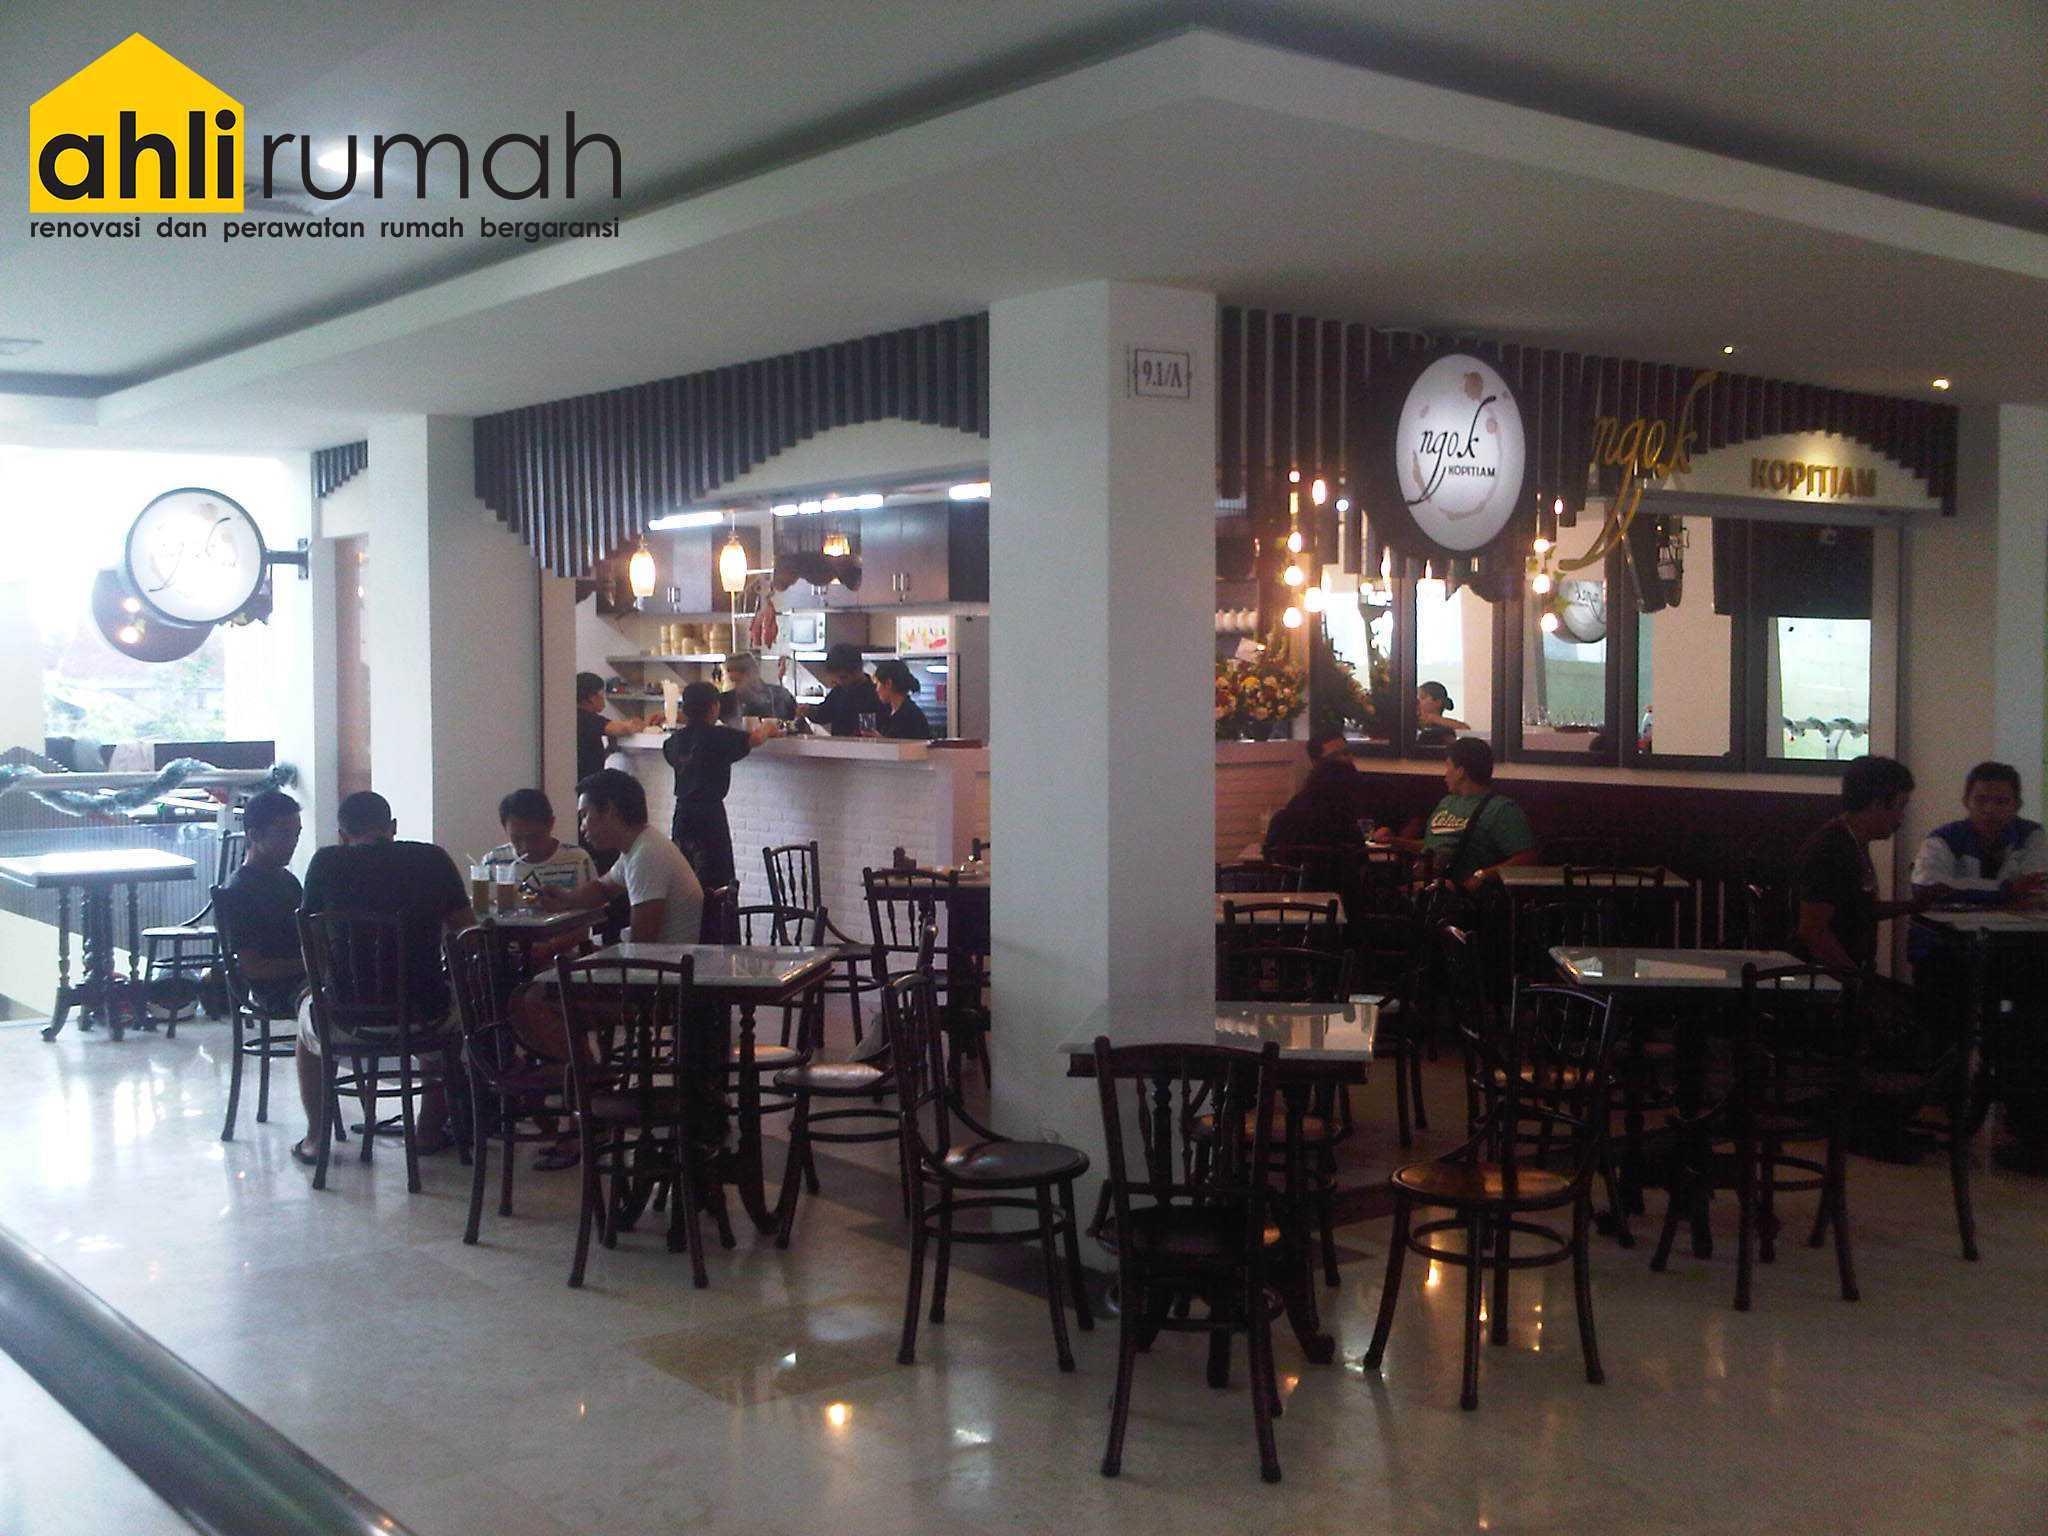 Ahlirumah.id Interior - Cafe Benoa   Ahlirumahid-Interior-Cafe-Benoa   49242